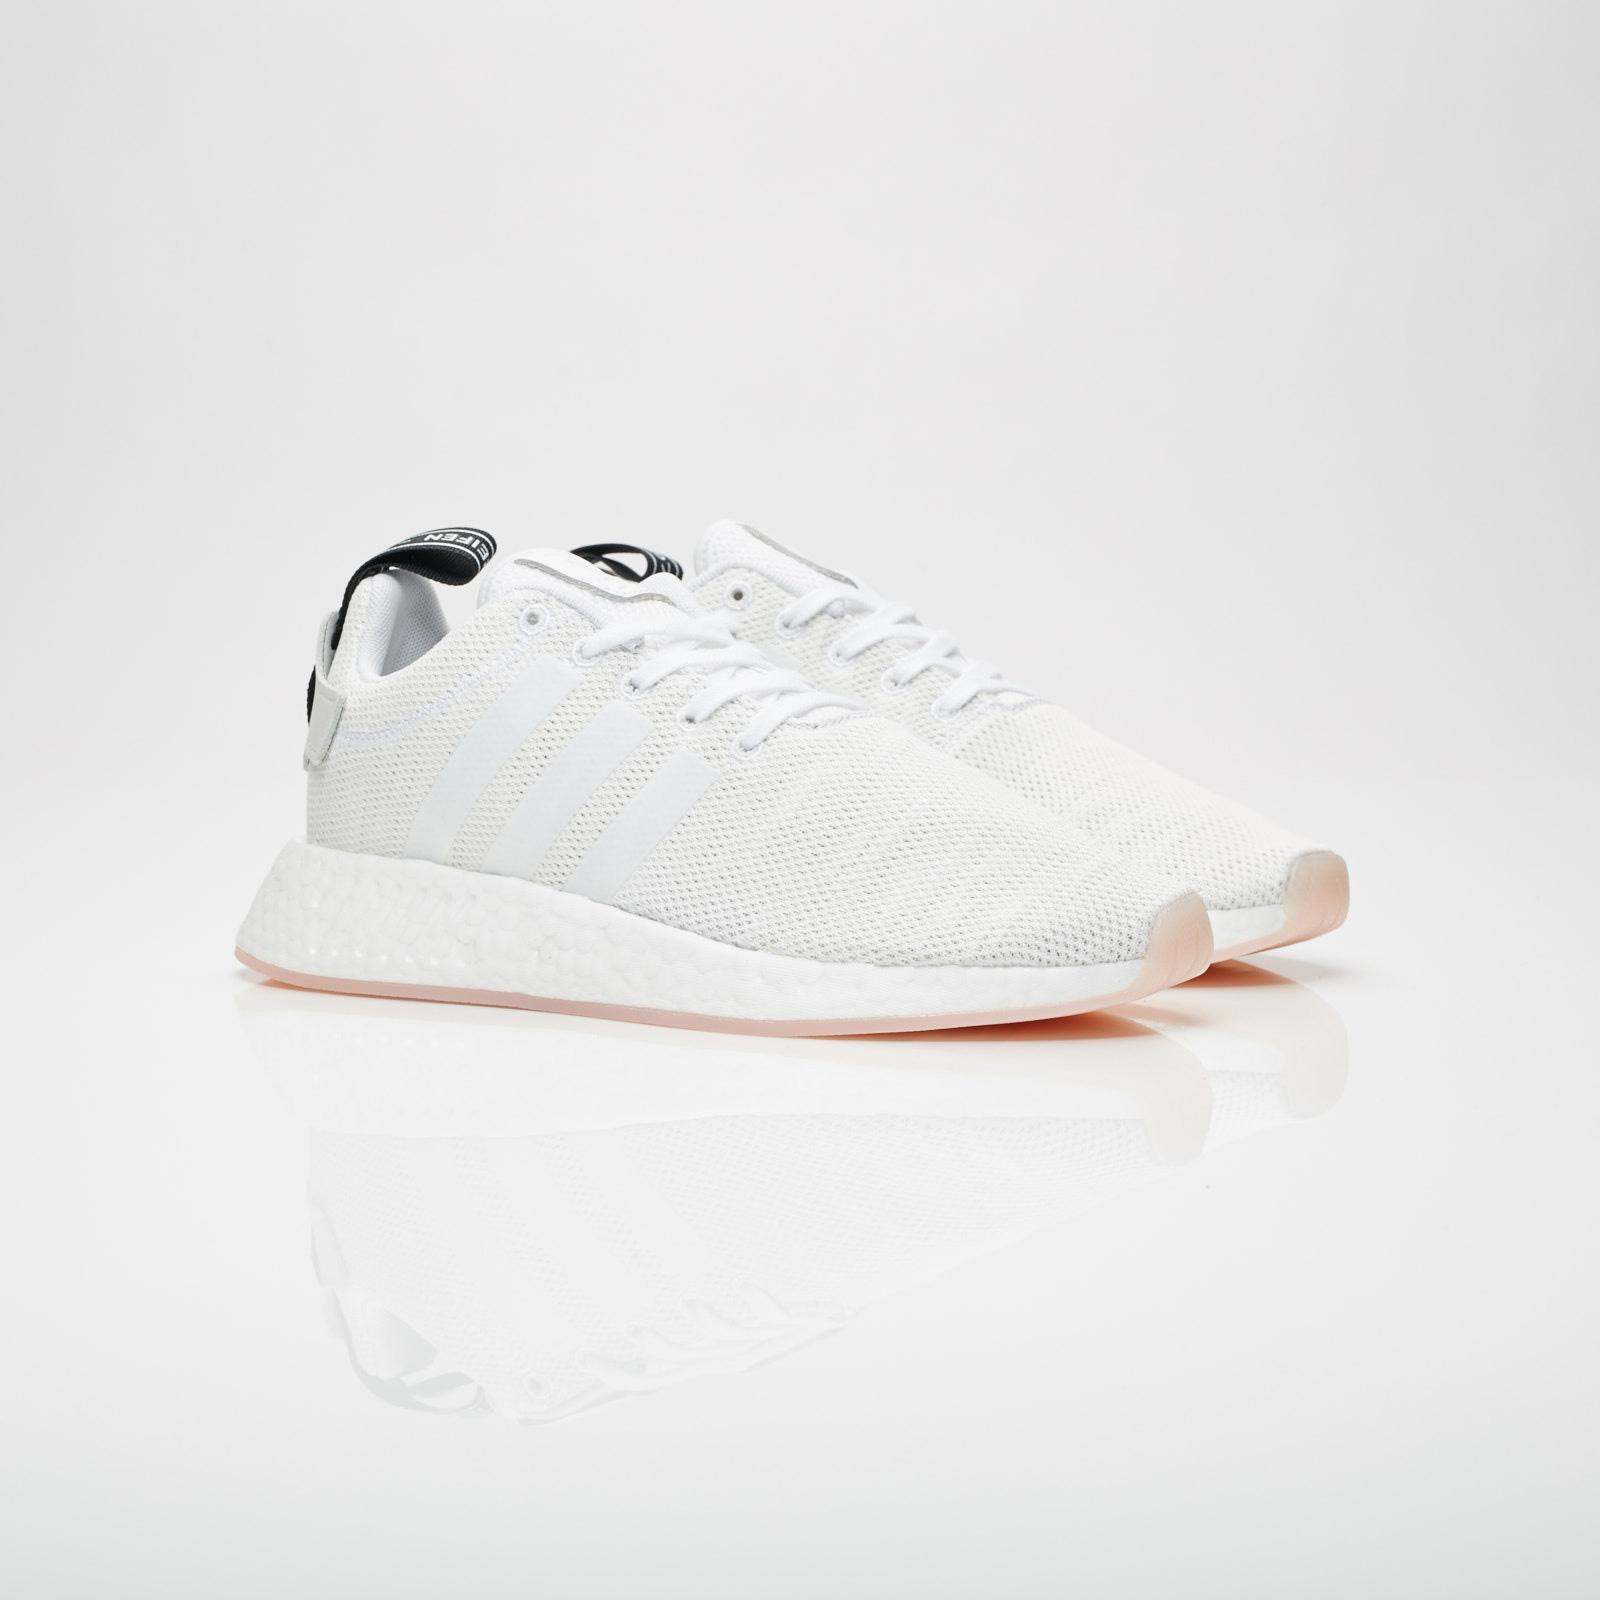 91bae2aed adidas NMD R2 W - Cq2009 - Sneakersnstuff